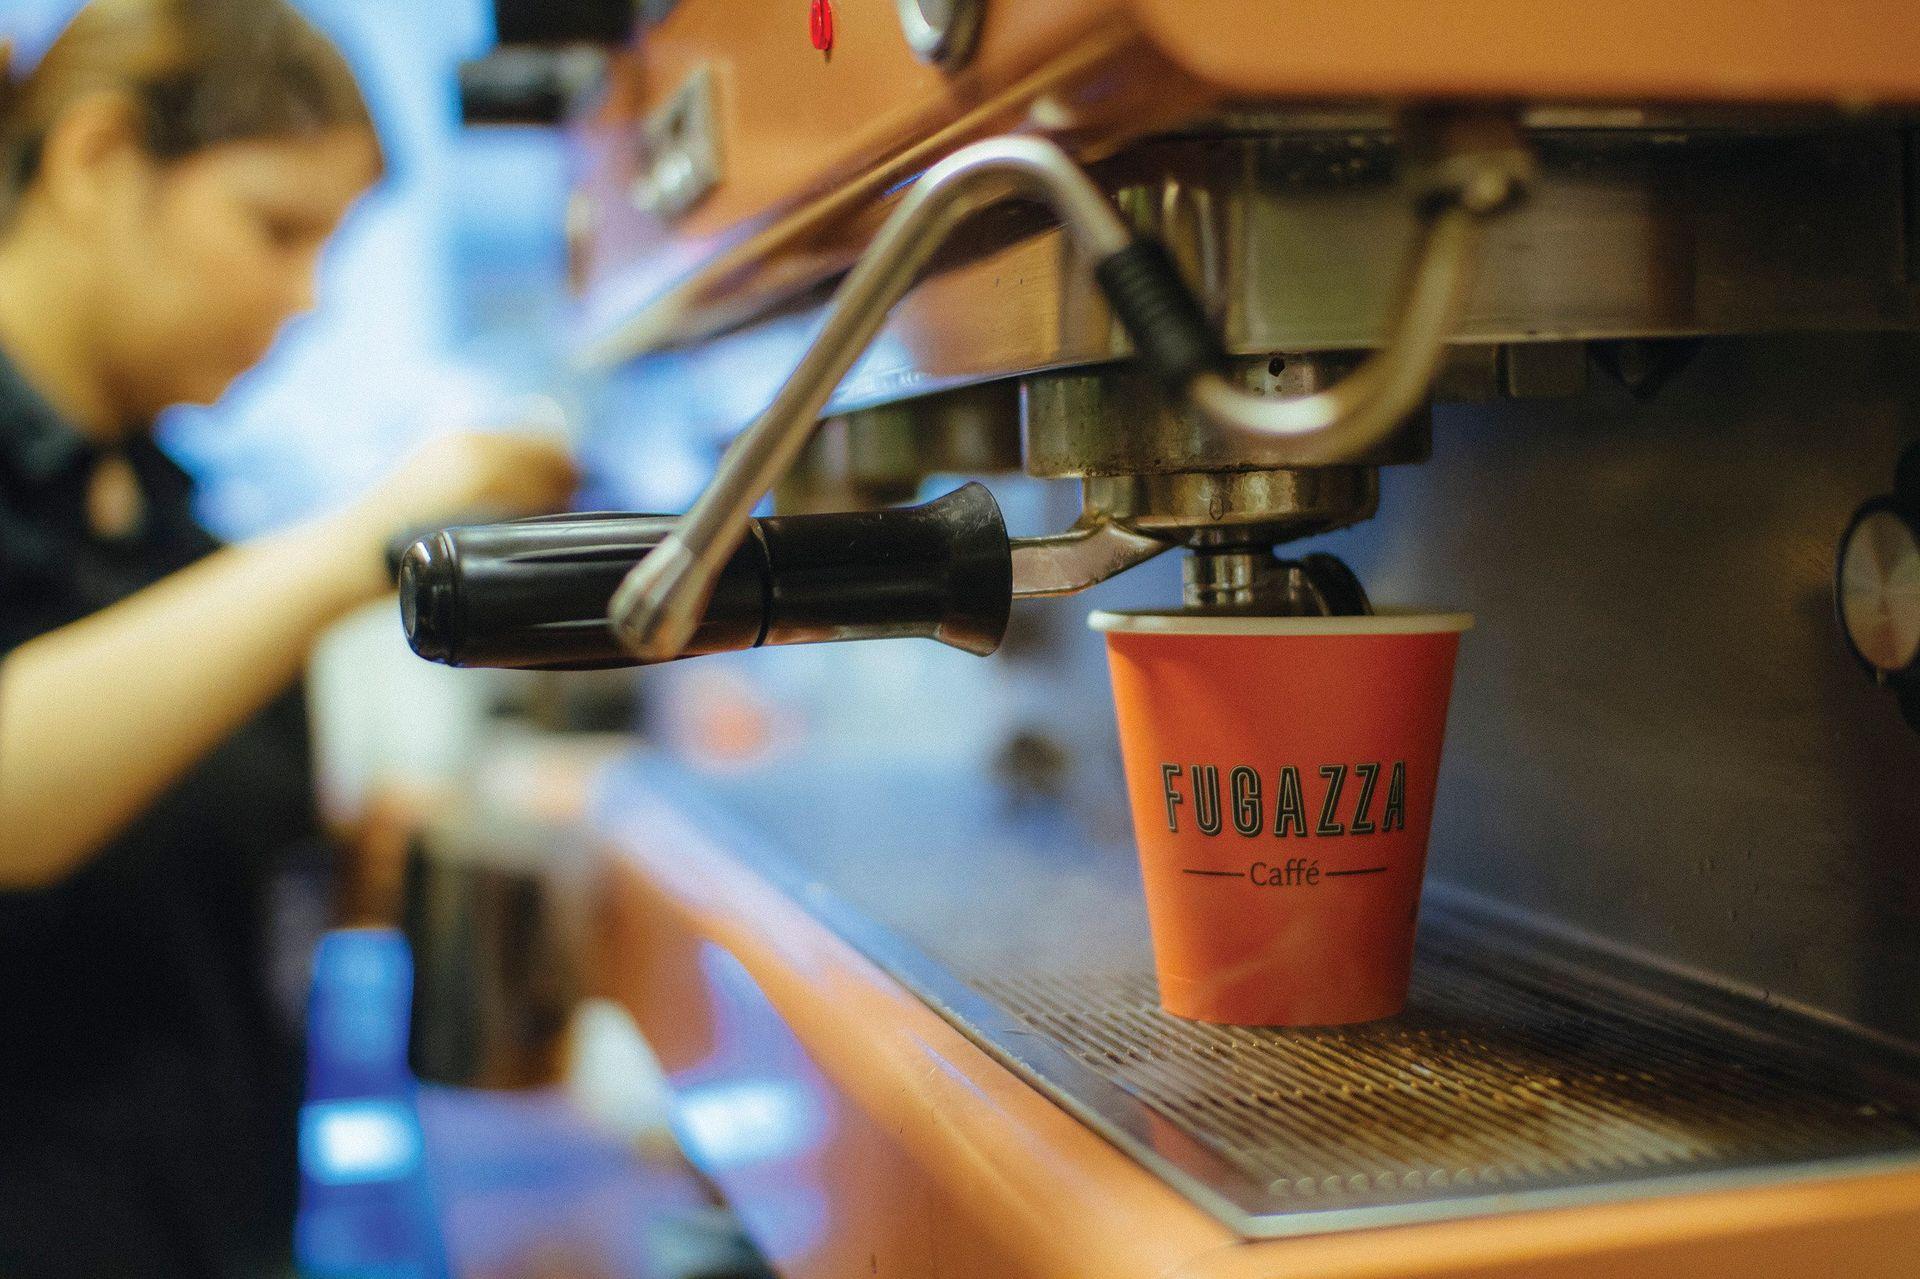 Kaffee Kaffeemaschine Frau bedient Kaffee Barrista Brühen Heiss